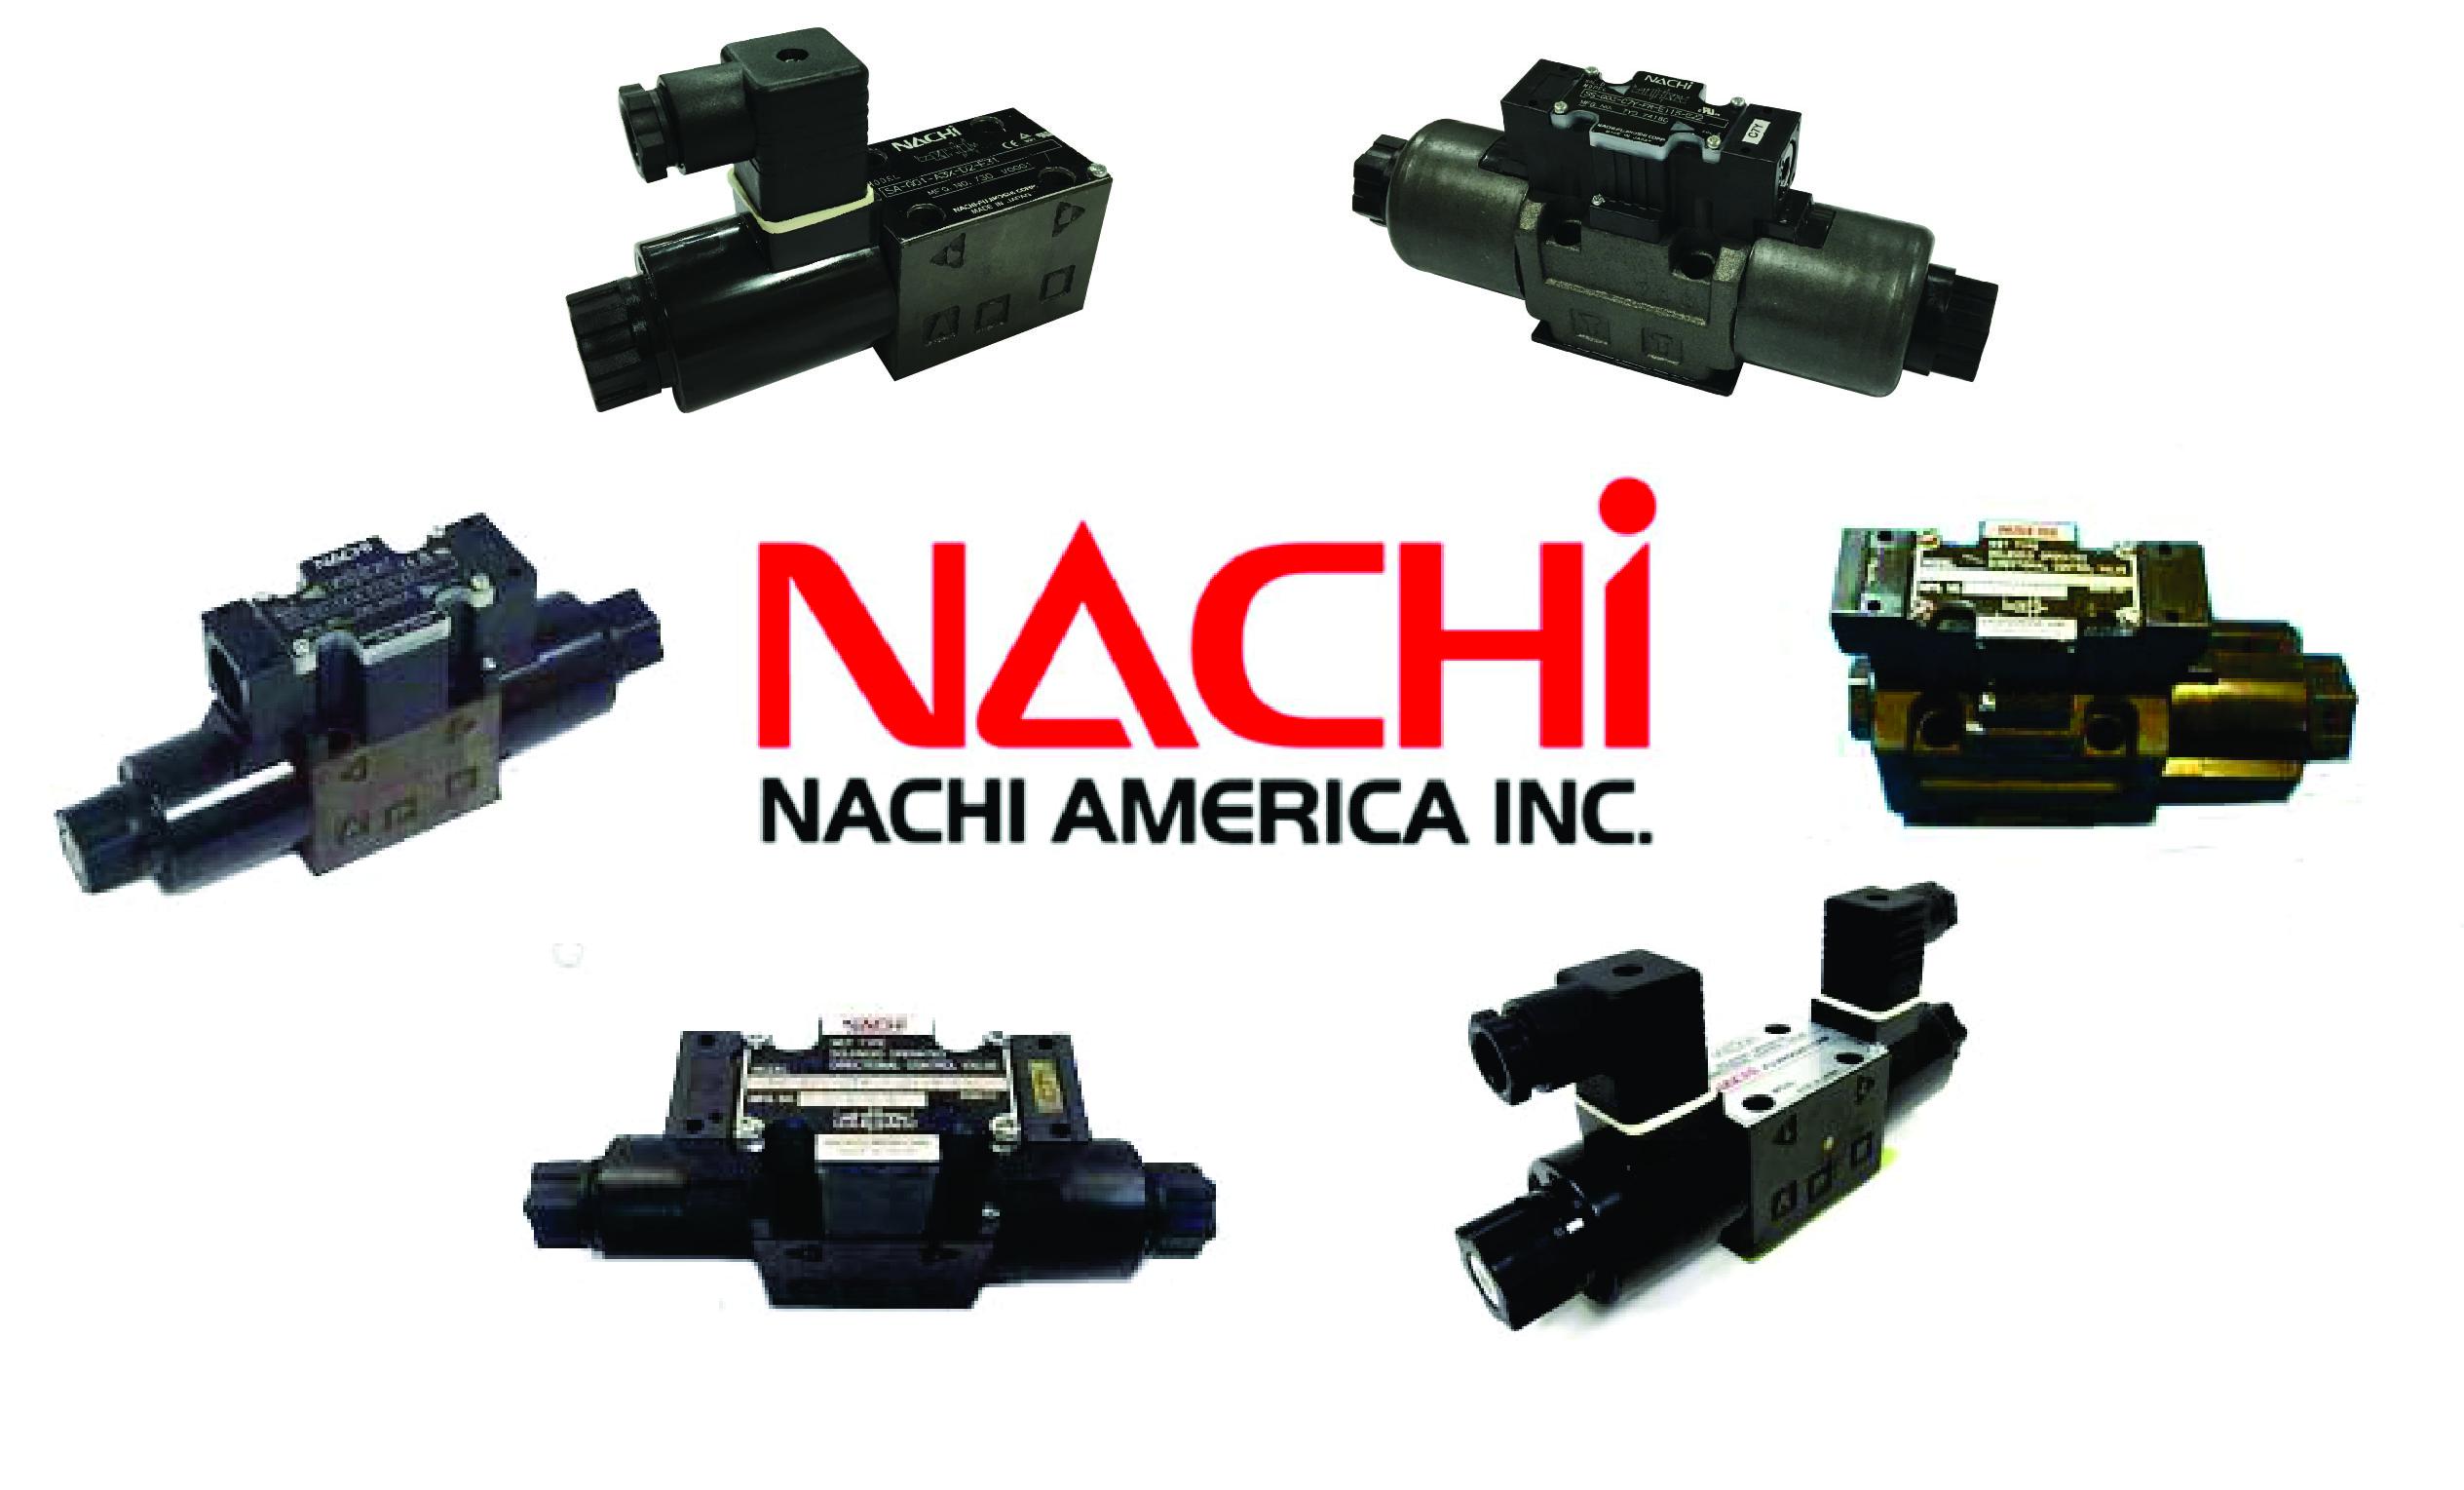 nachi-valves.jpg